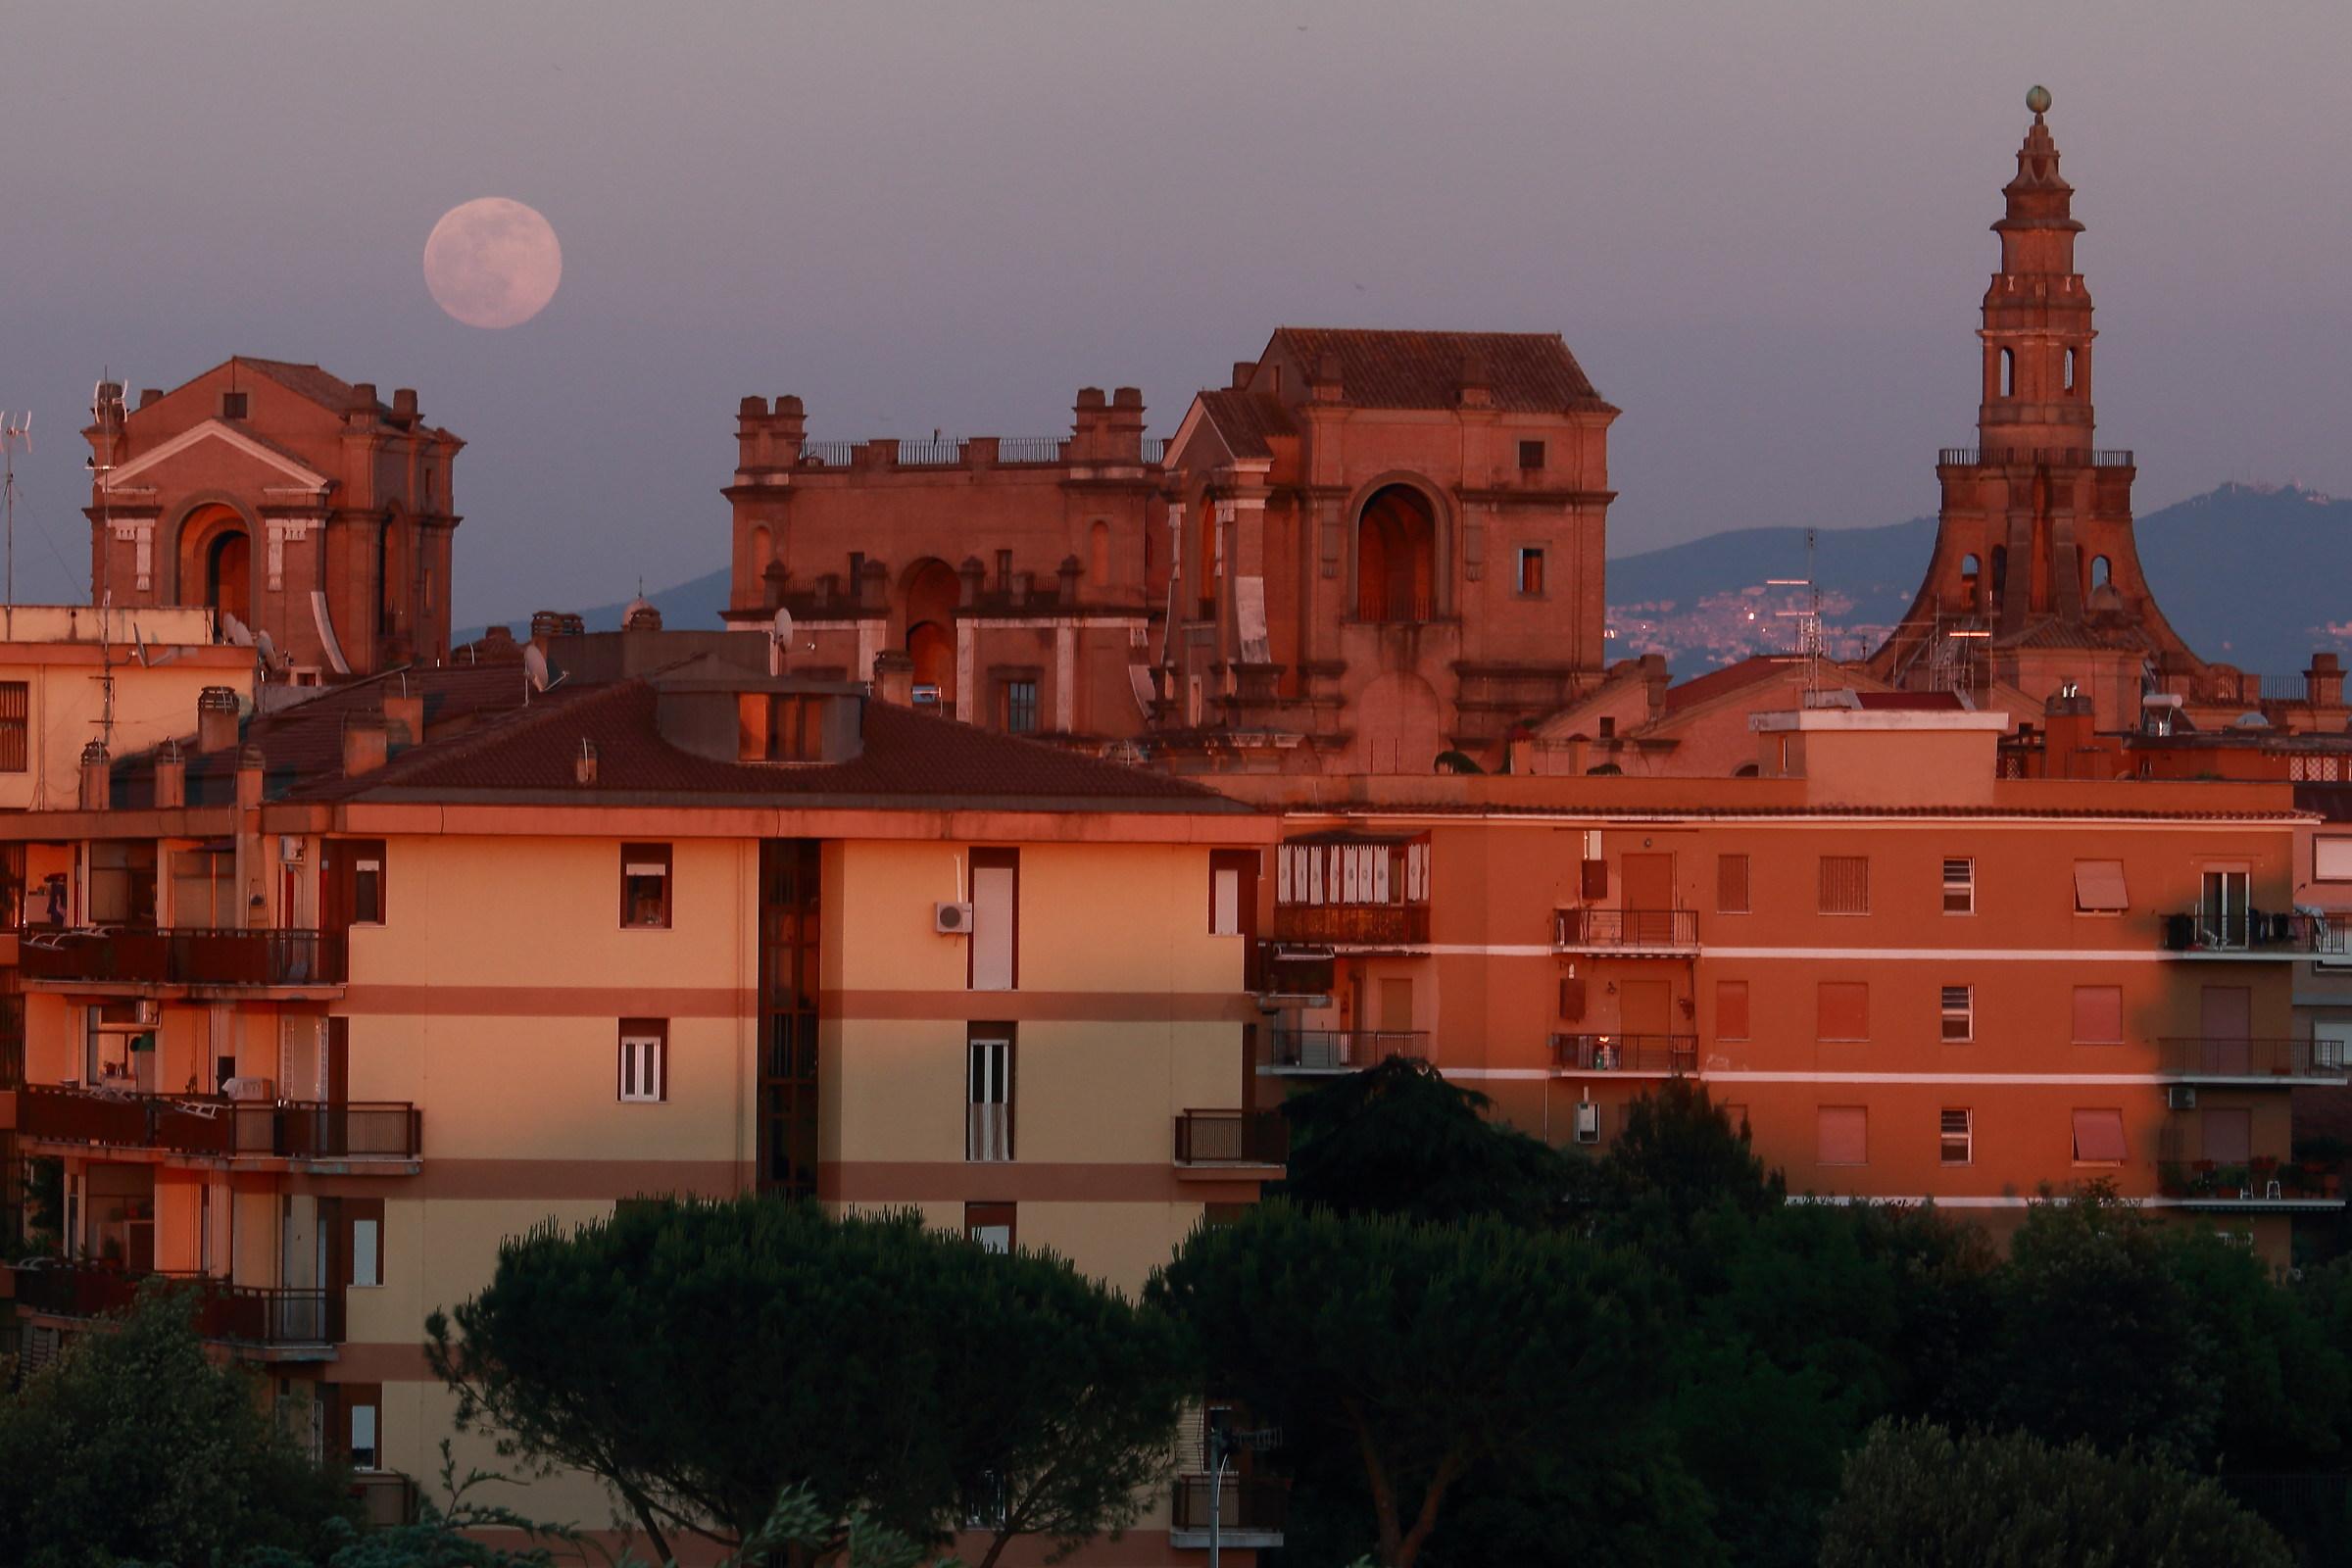 The moon rises on high school...